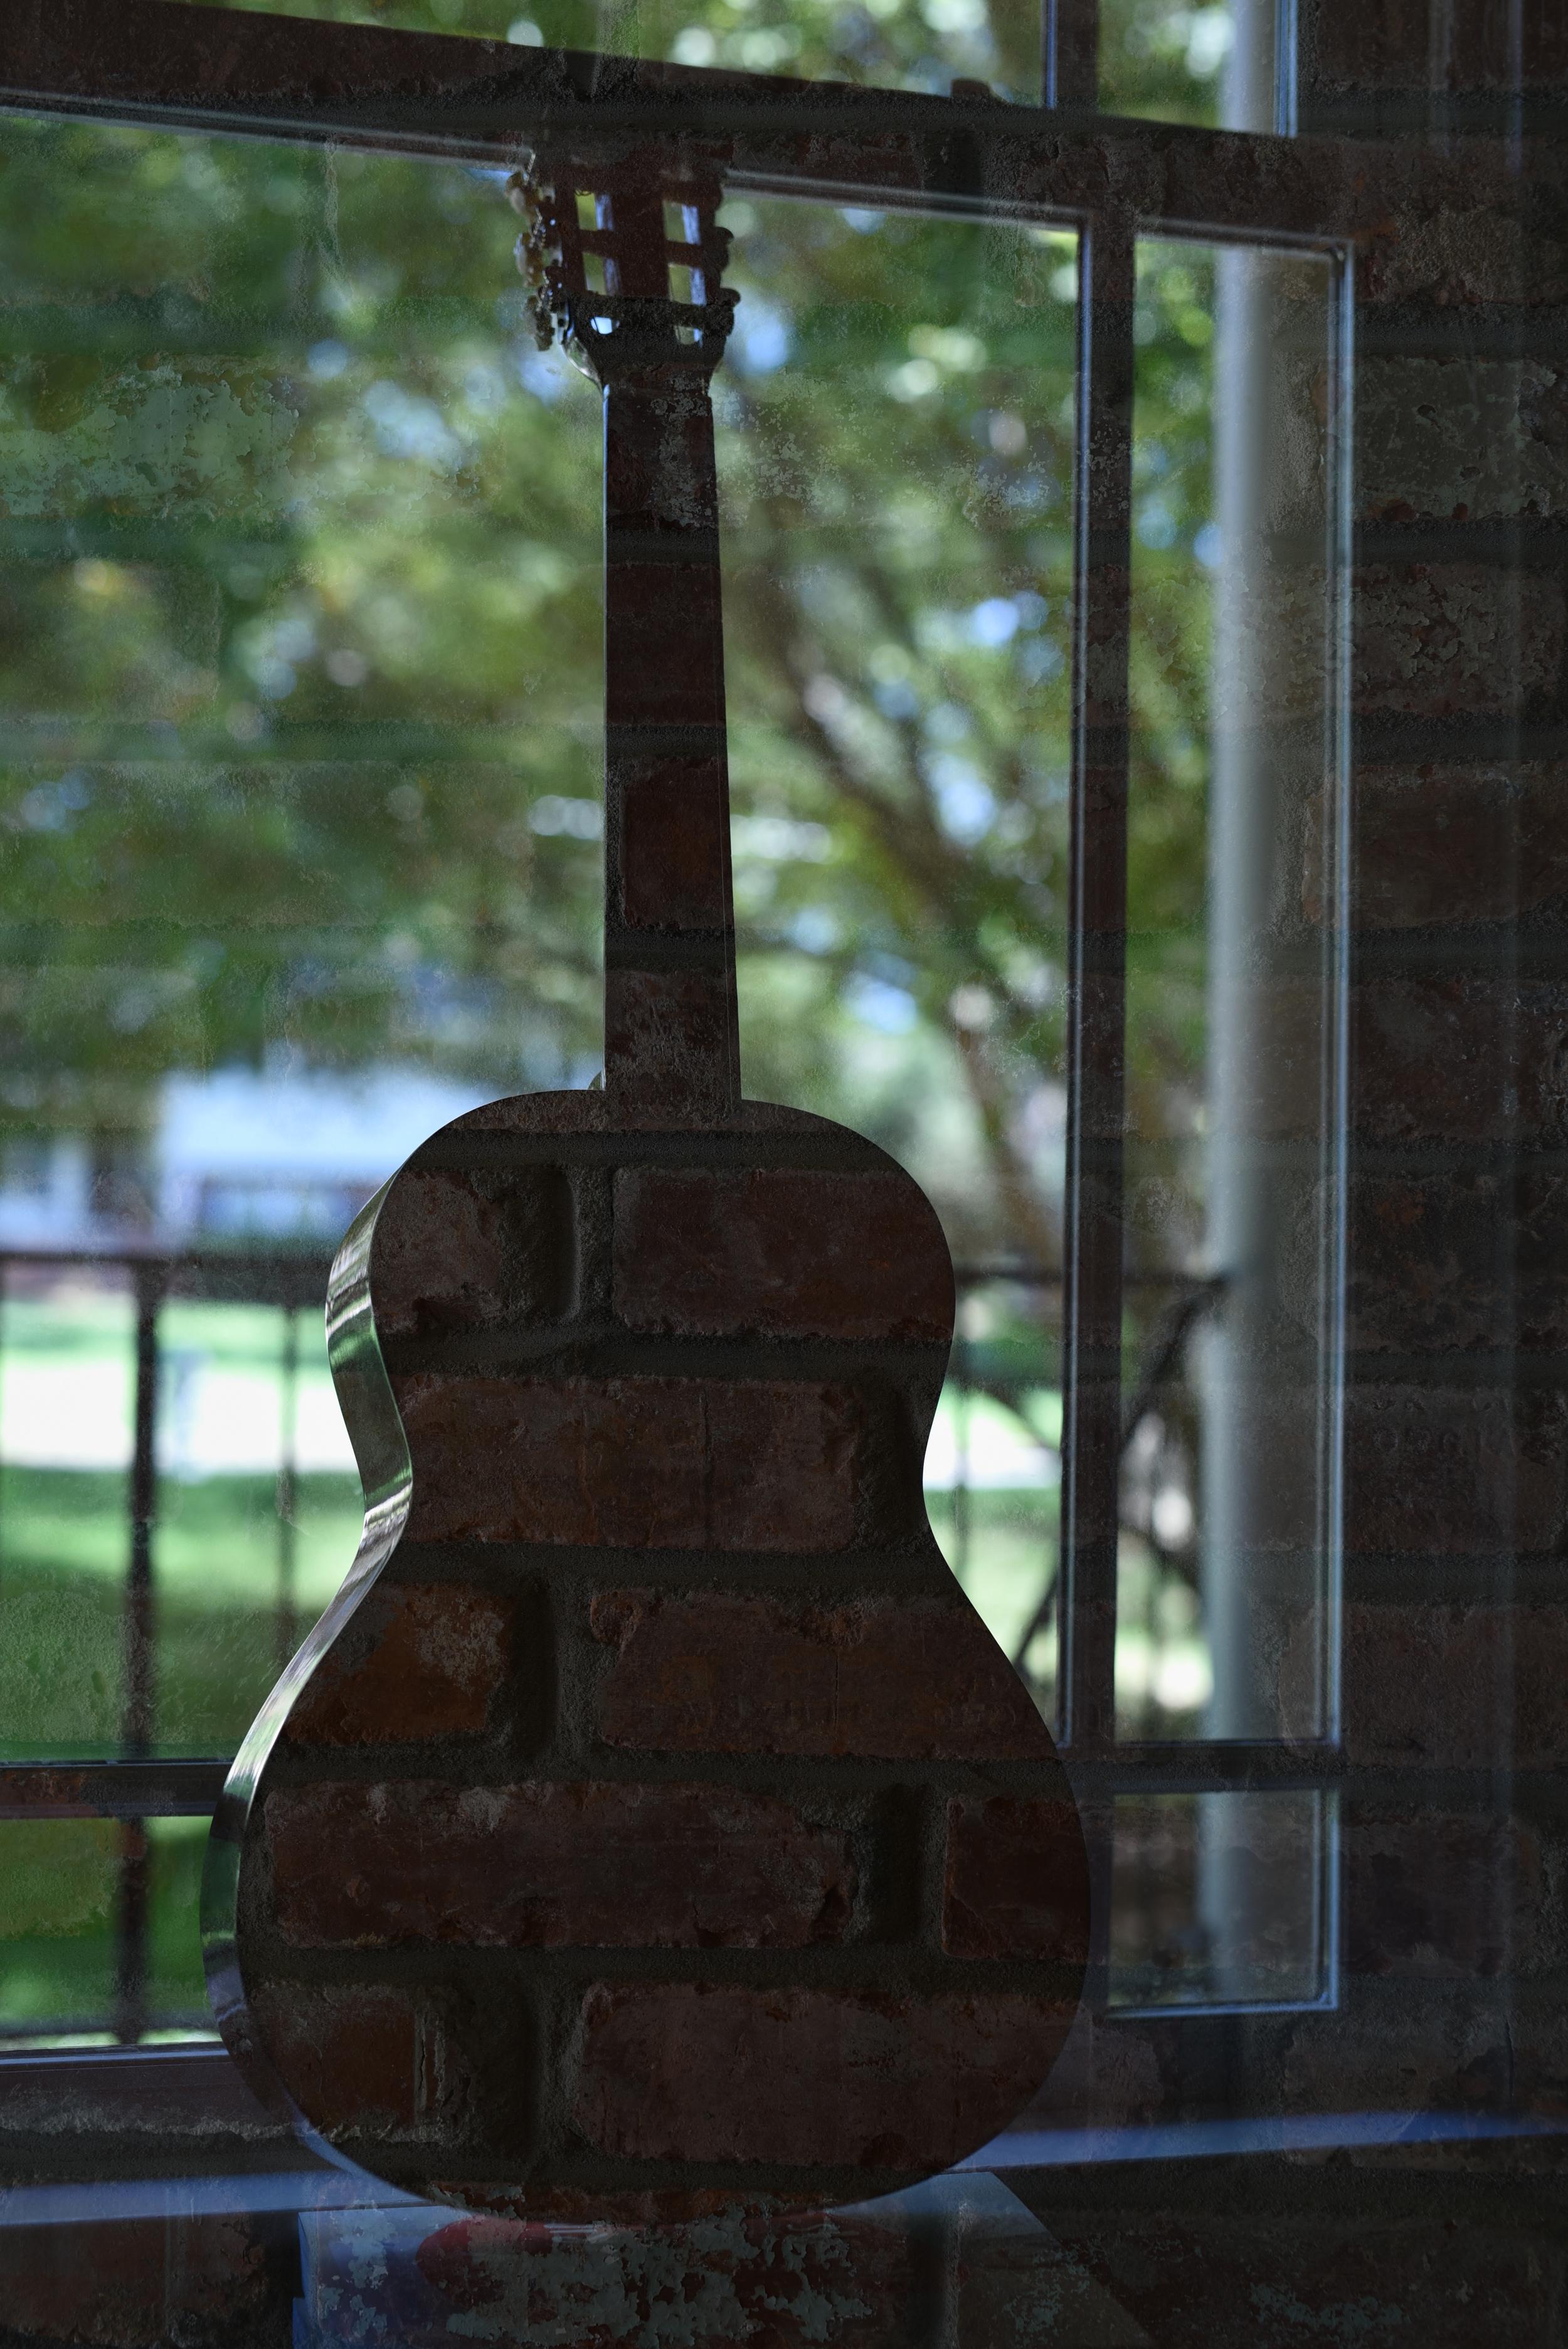 guitar-and-bricks.jpg